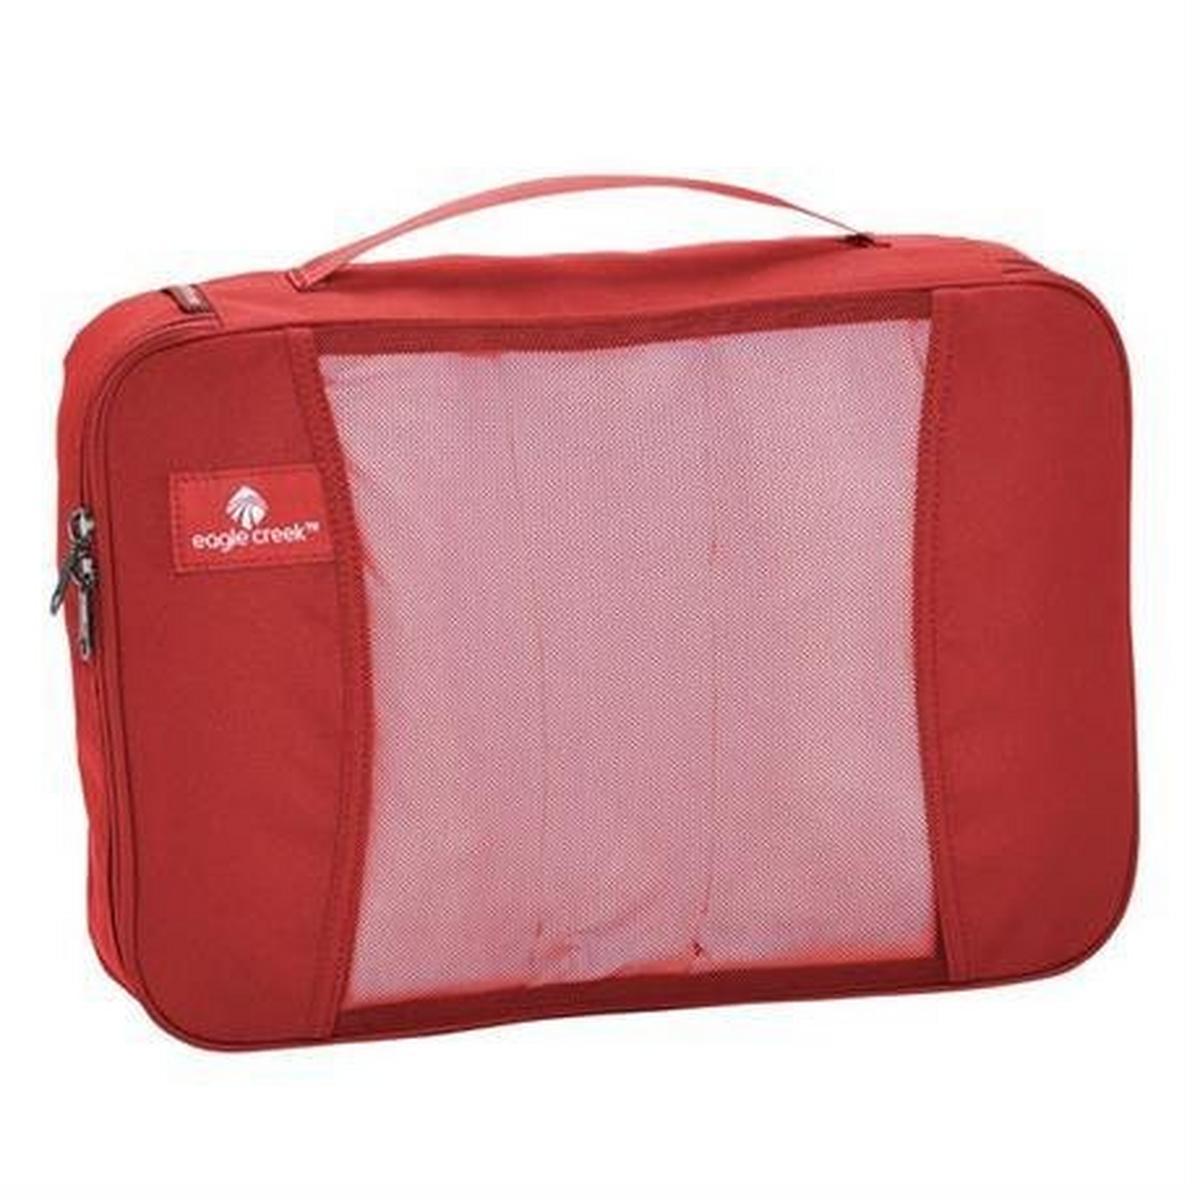 Eagle Creek Travel Luggage: Pack-It Original Cube MEDIUM Red Fire